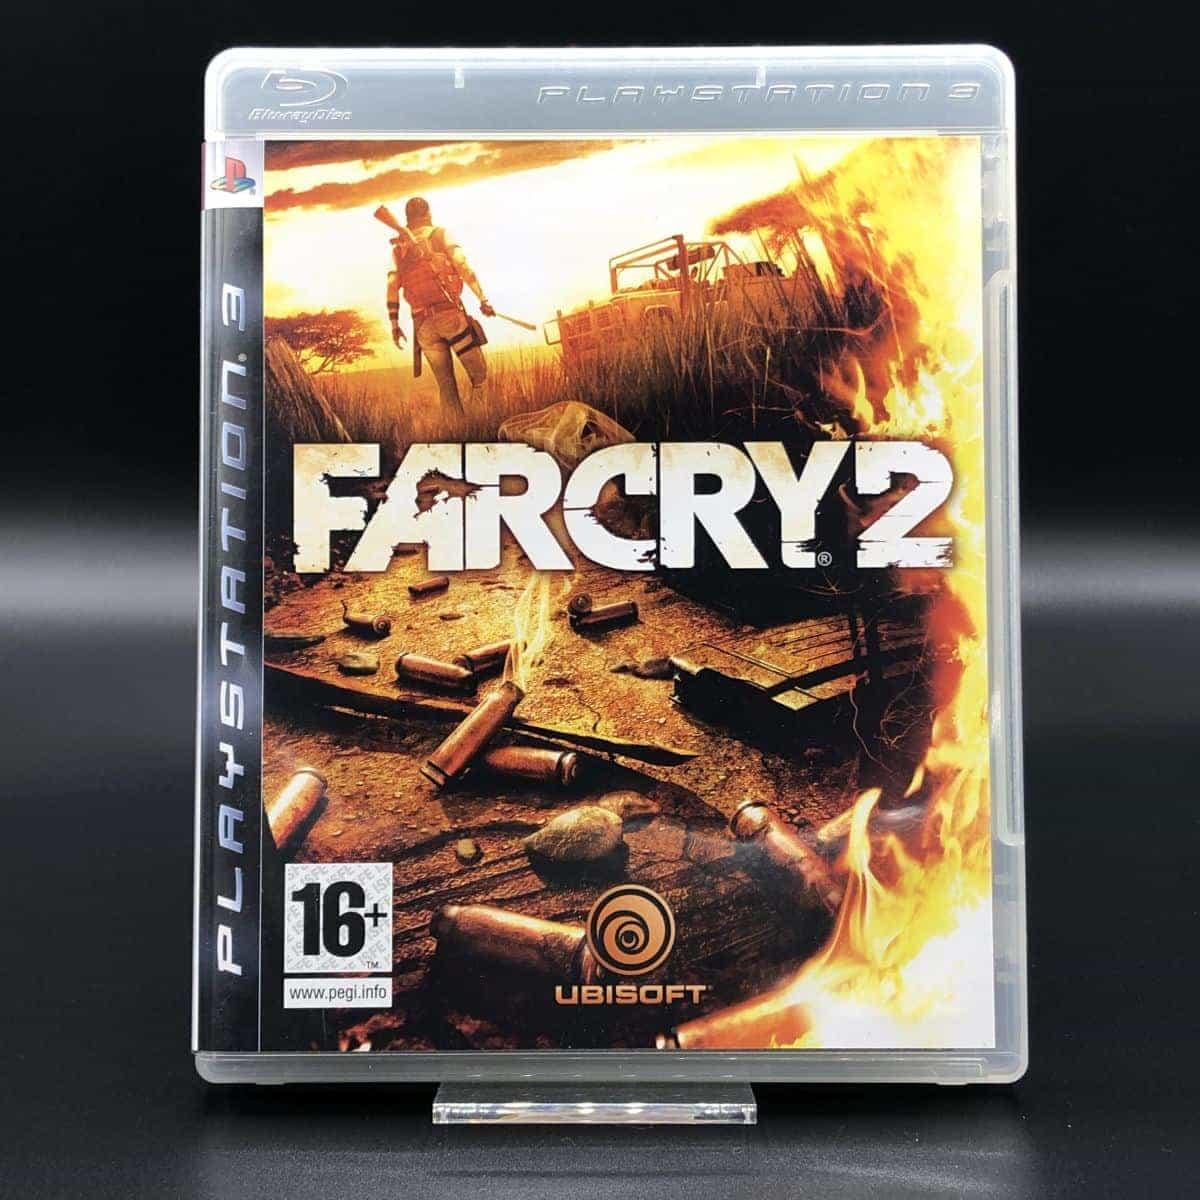 PS3 Far Cry 2 (Komplett) (Sehr gut) Sony PlayStation 3 (FSK18)